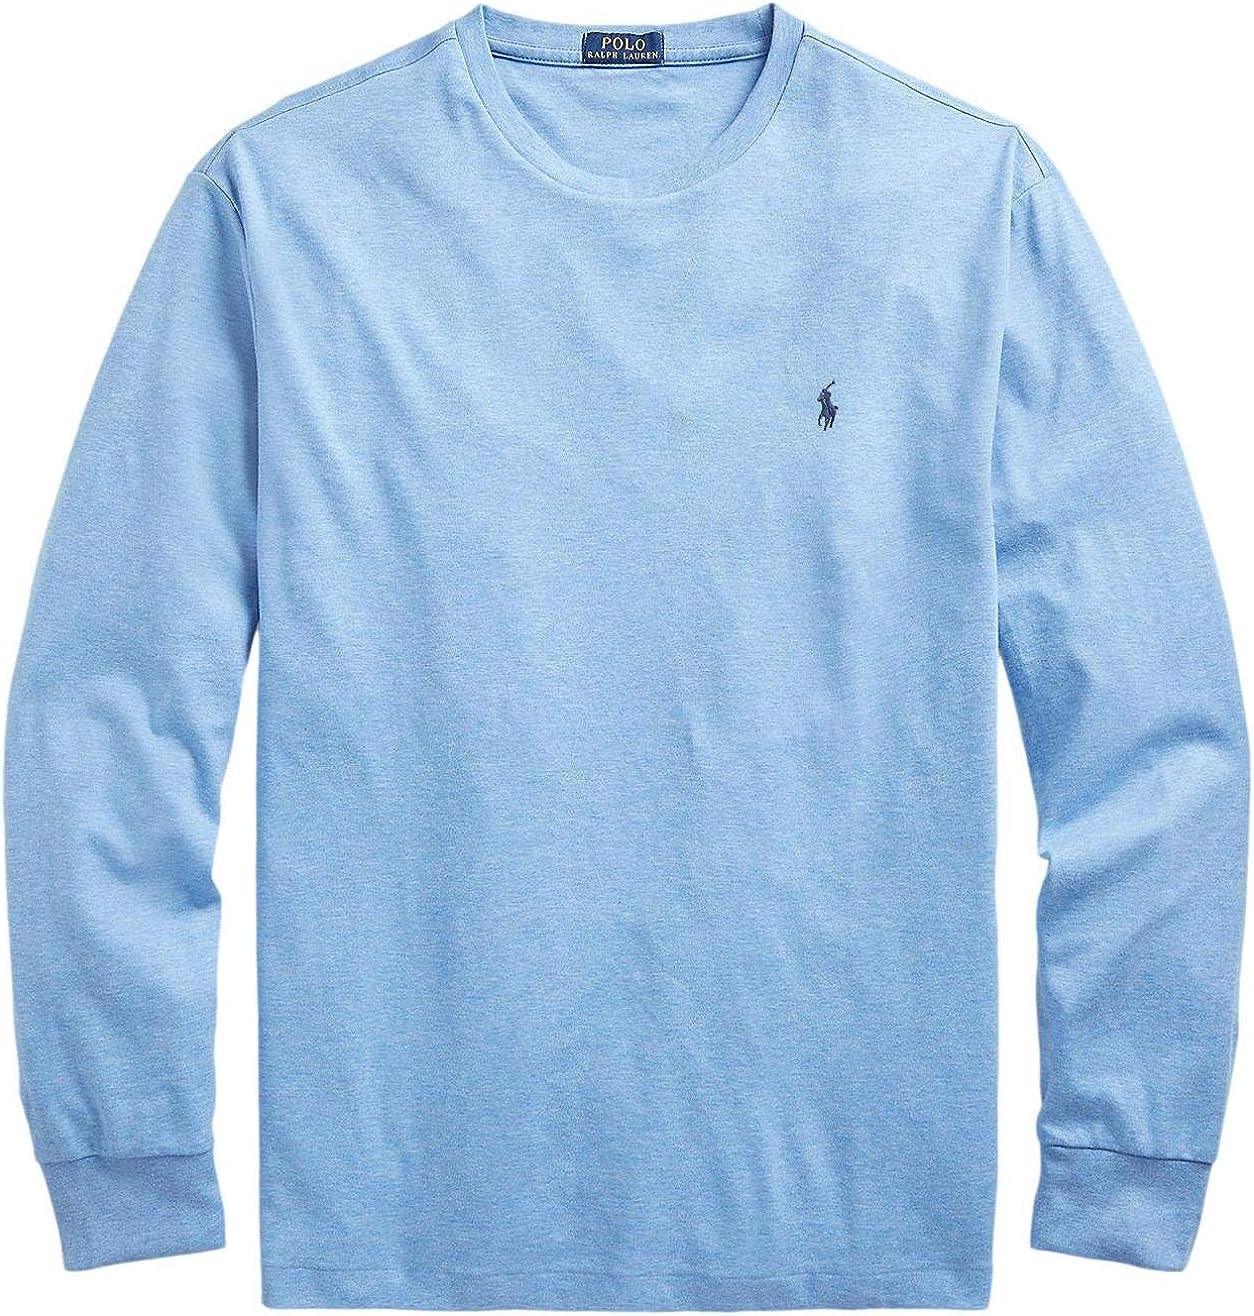 Polo Ralph Lauren Men's Crew High quality new Tee Long Sleeve sale Neck